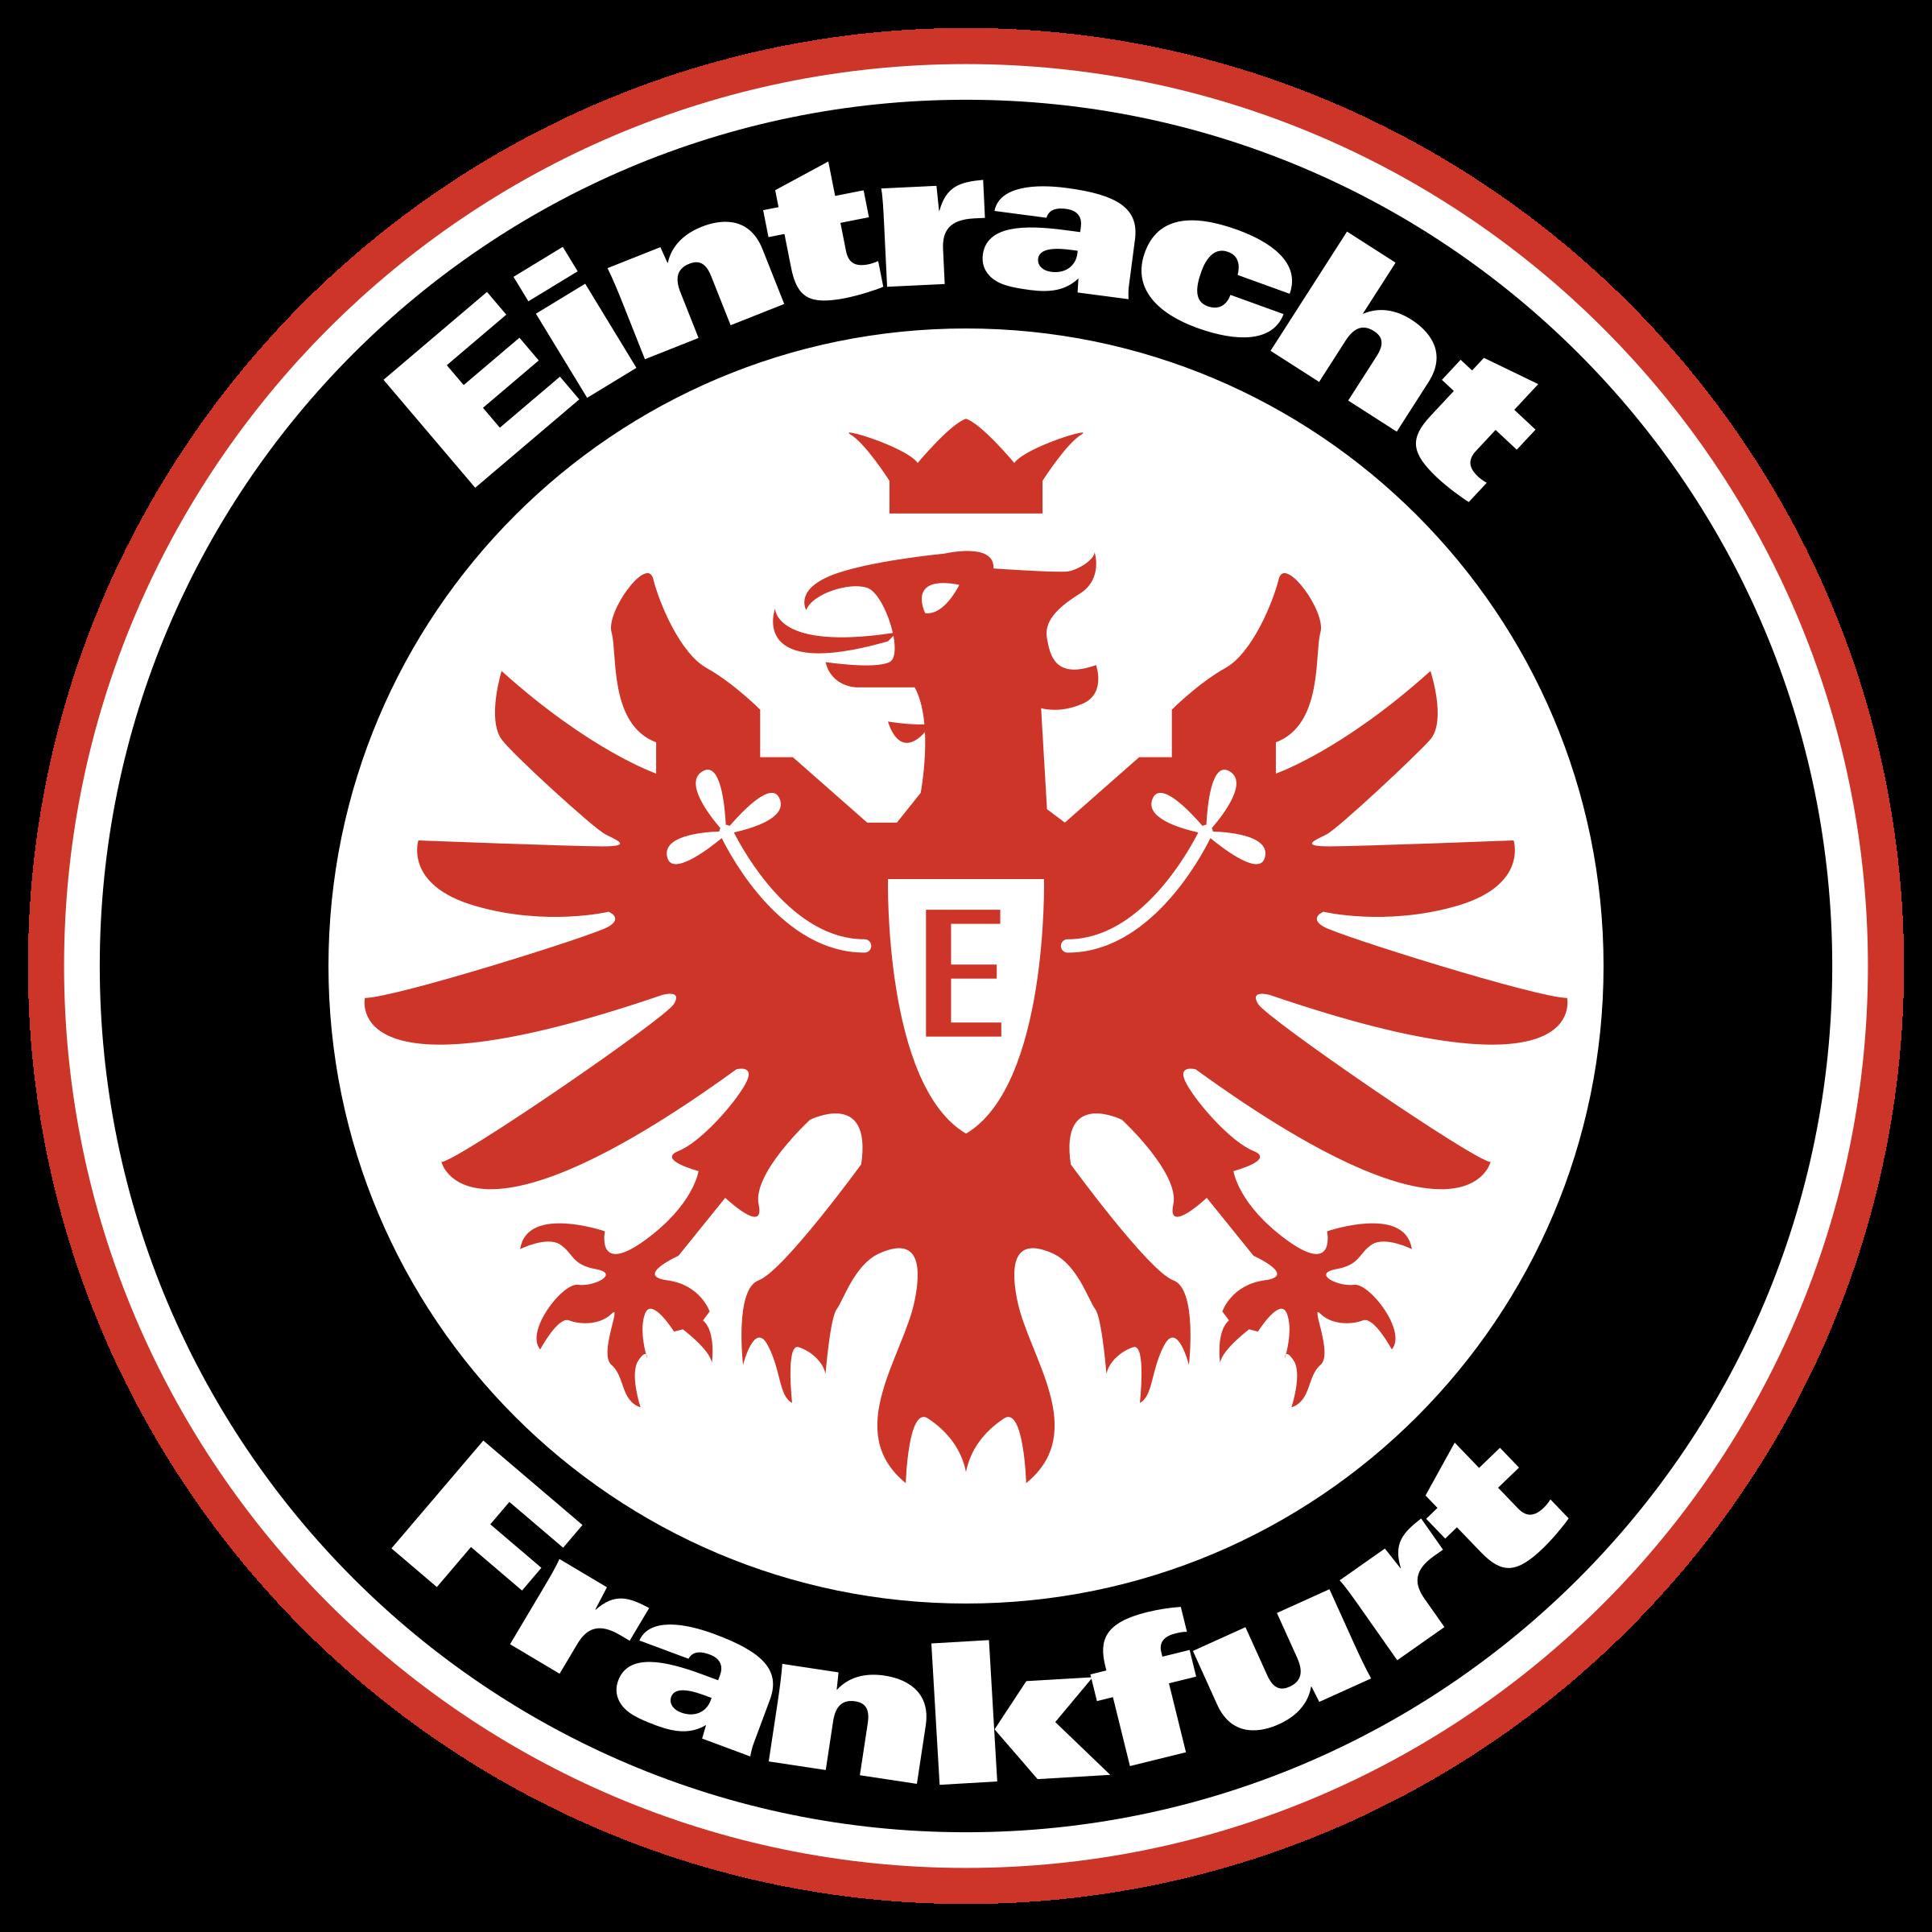 Eintracht Logo Png Transparent & Svg Vector - Pluspng Pluspng.com - Eintracht Logo PNG